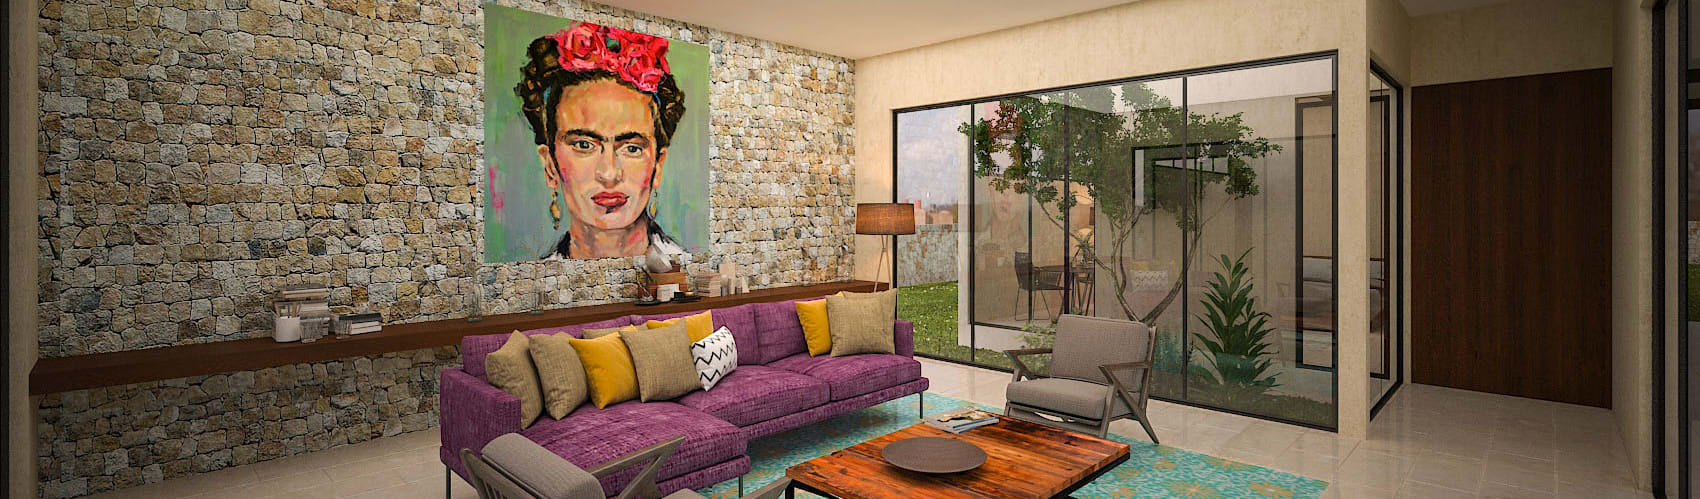 Ileana Pérez Arquitectura + Diseño